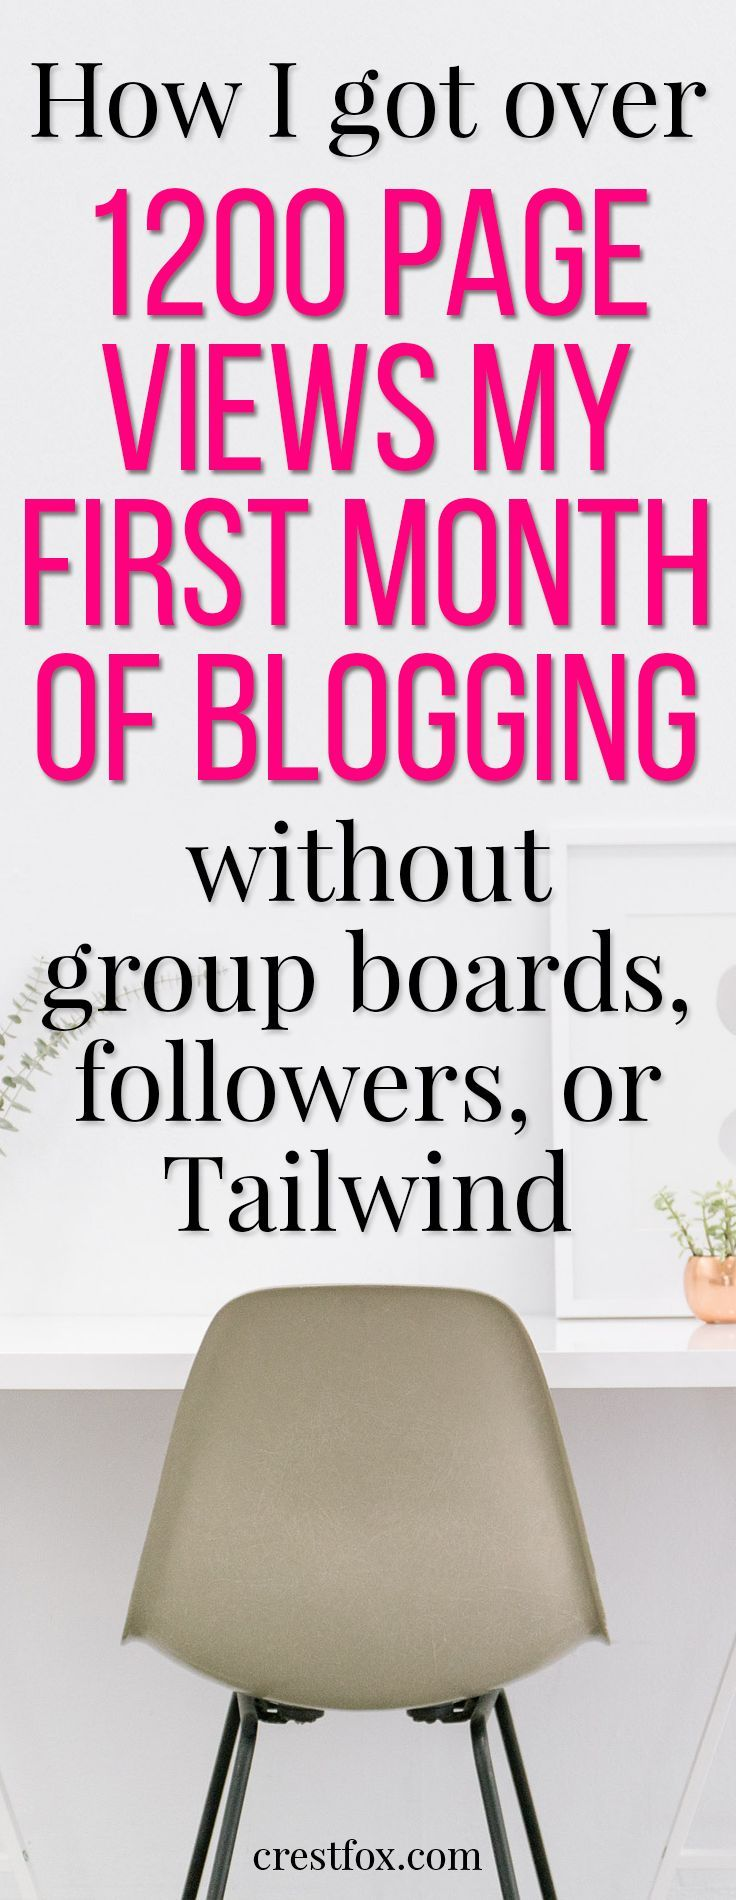 Blogging pageviews!! #blogging #pageviews